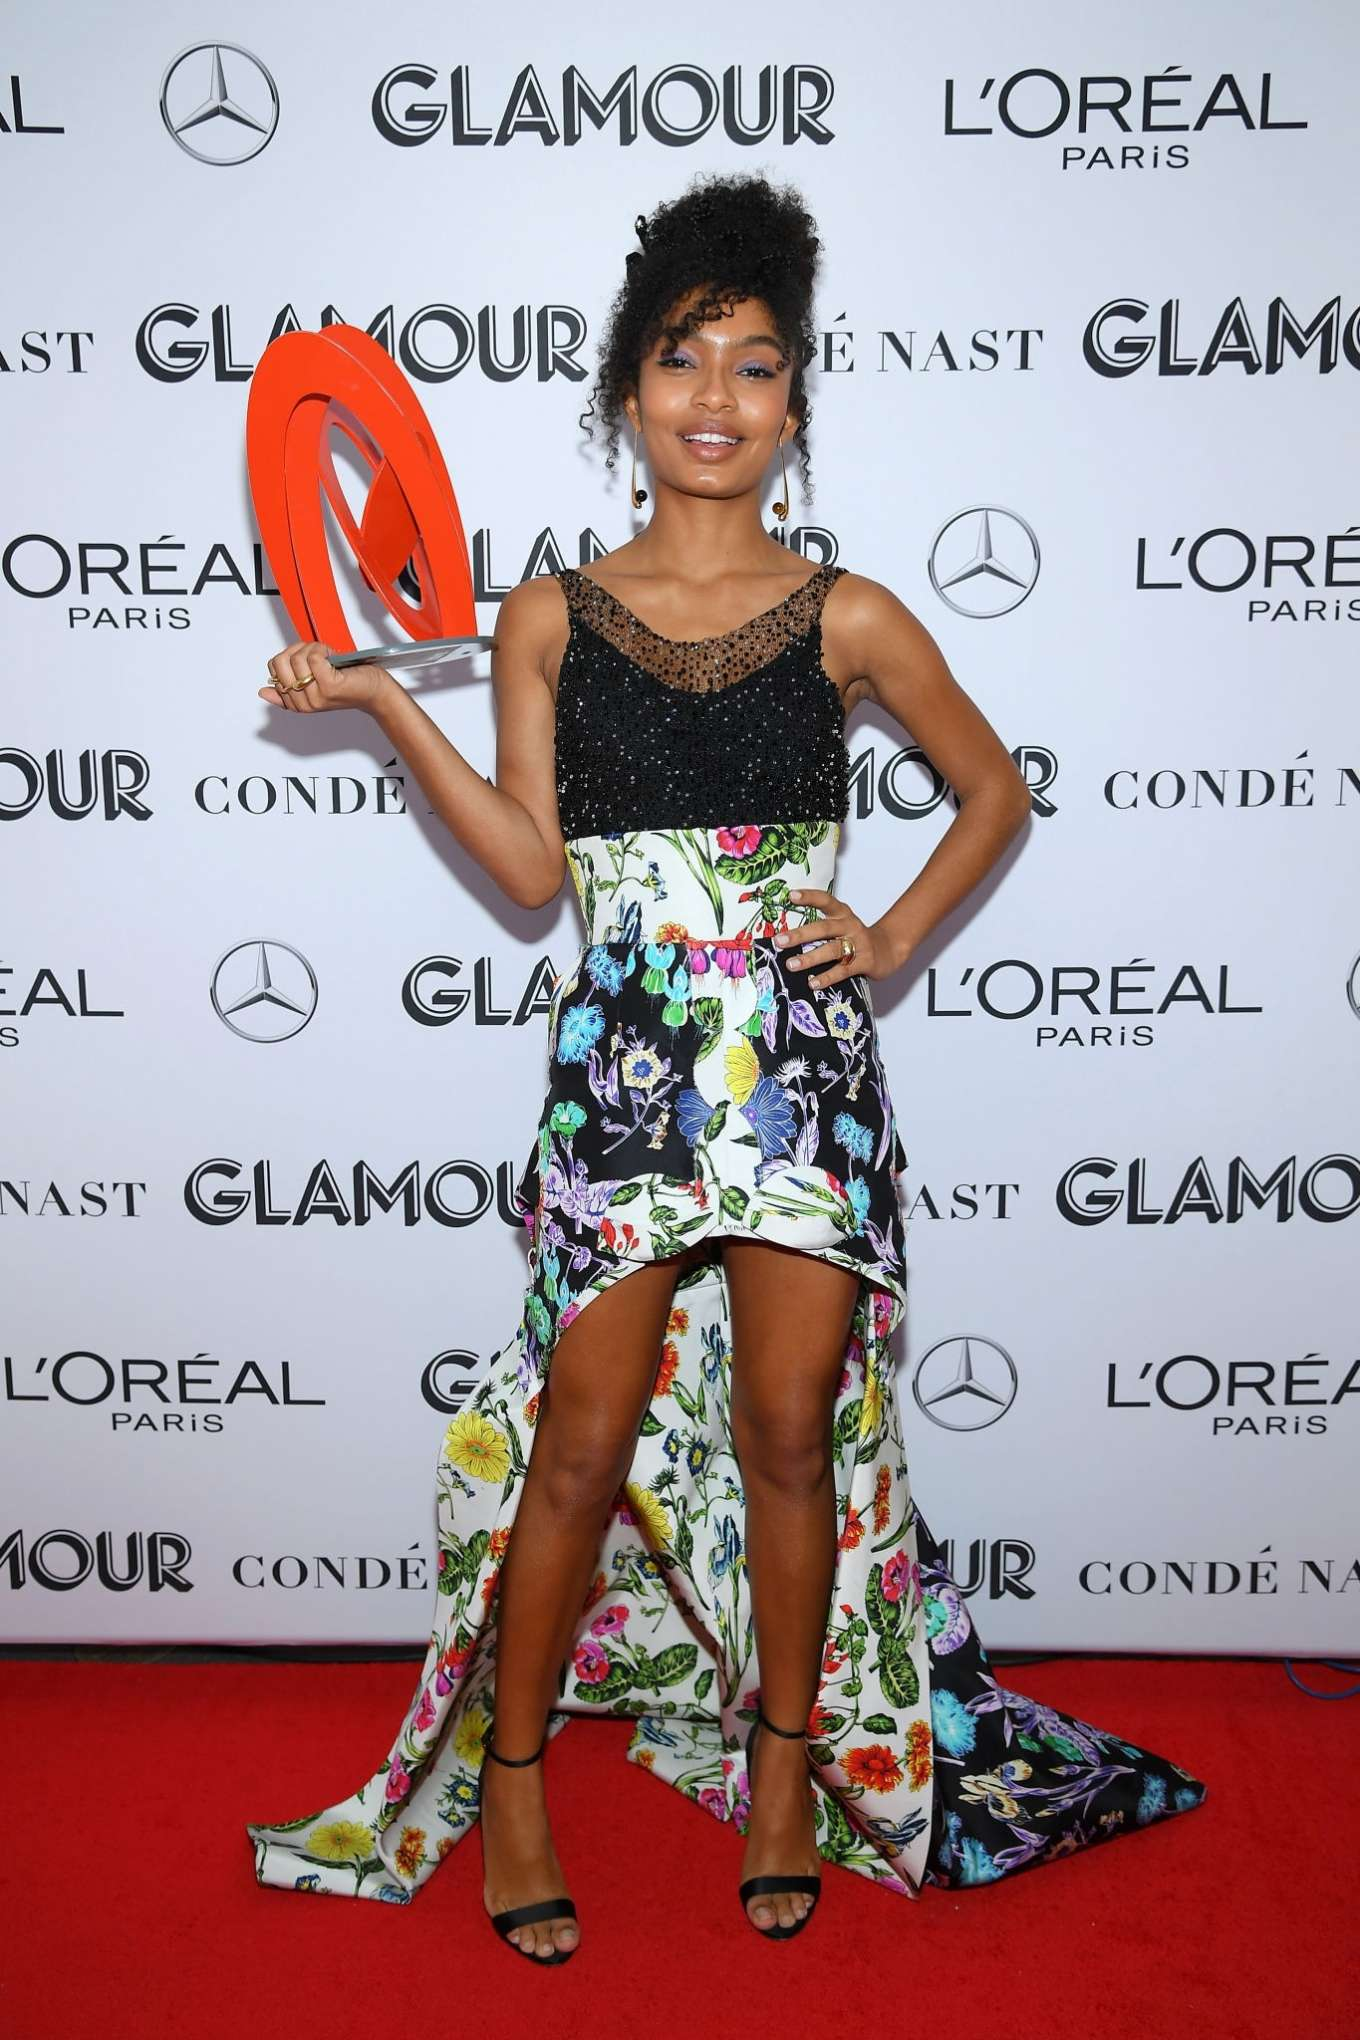 Yara Shahidi - Glamour Women Of The Year Awards 2019 in NYC